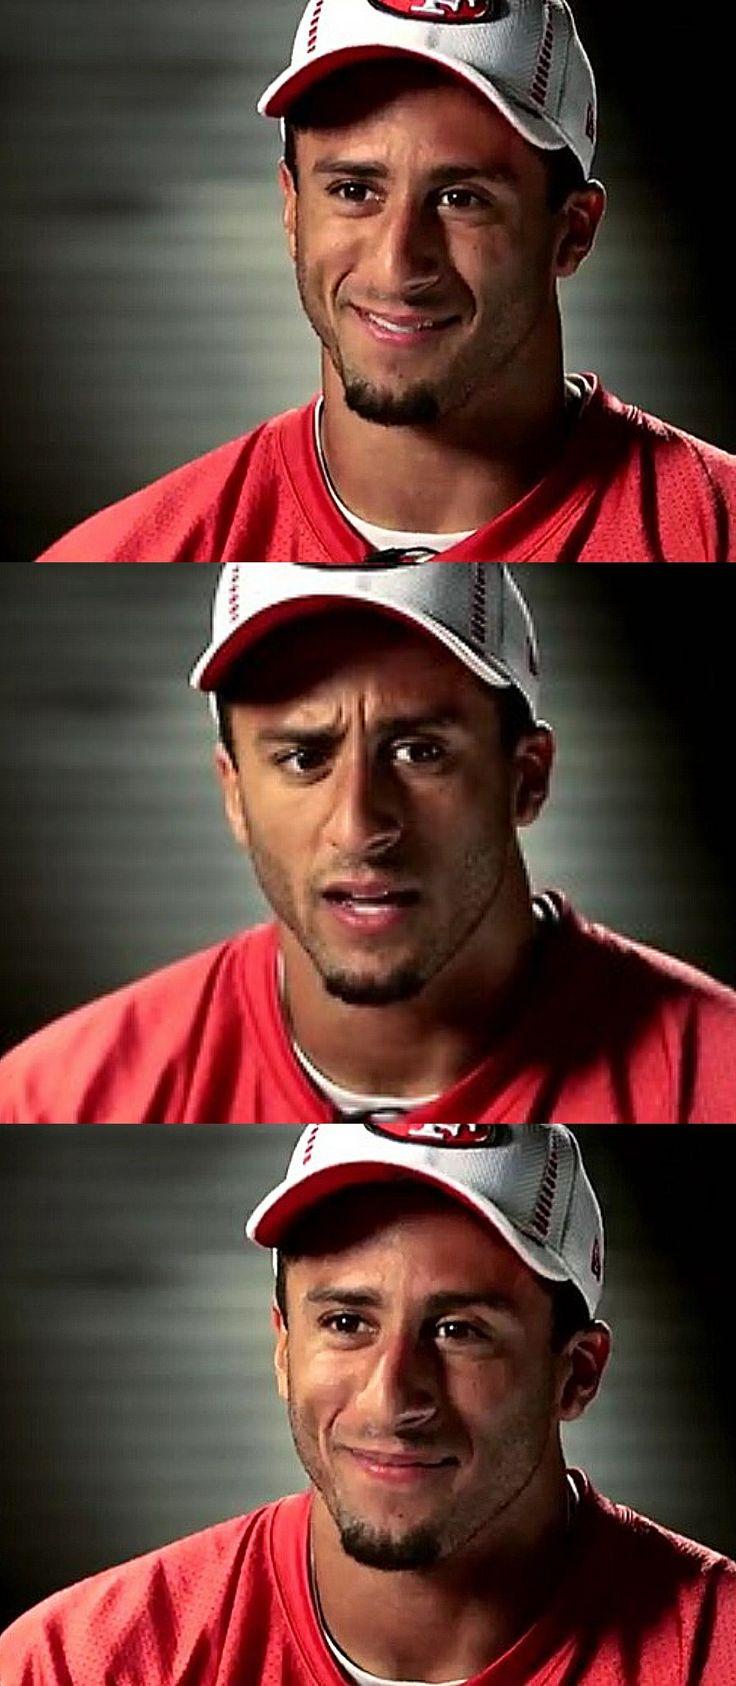 Colin Kaepernick 49ers. Oh how much I adore you!!! You're such a cutie, a cute dork;)!